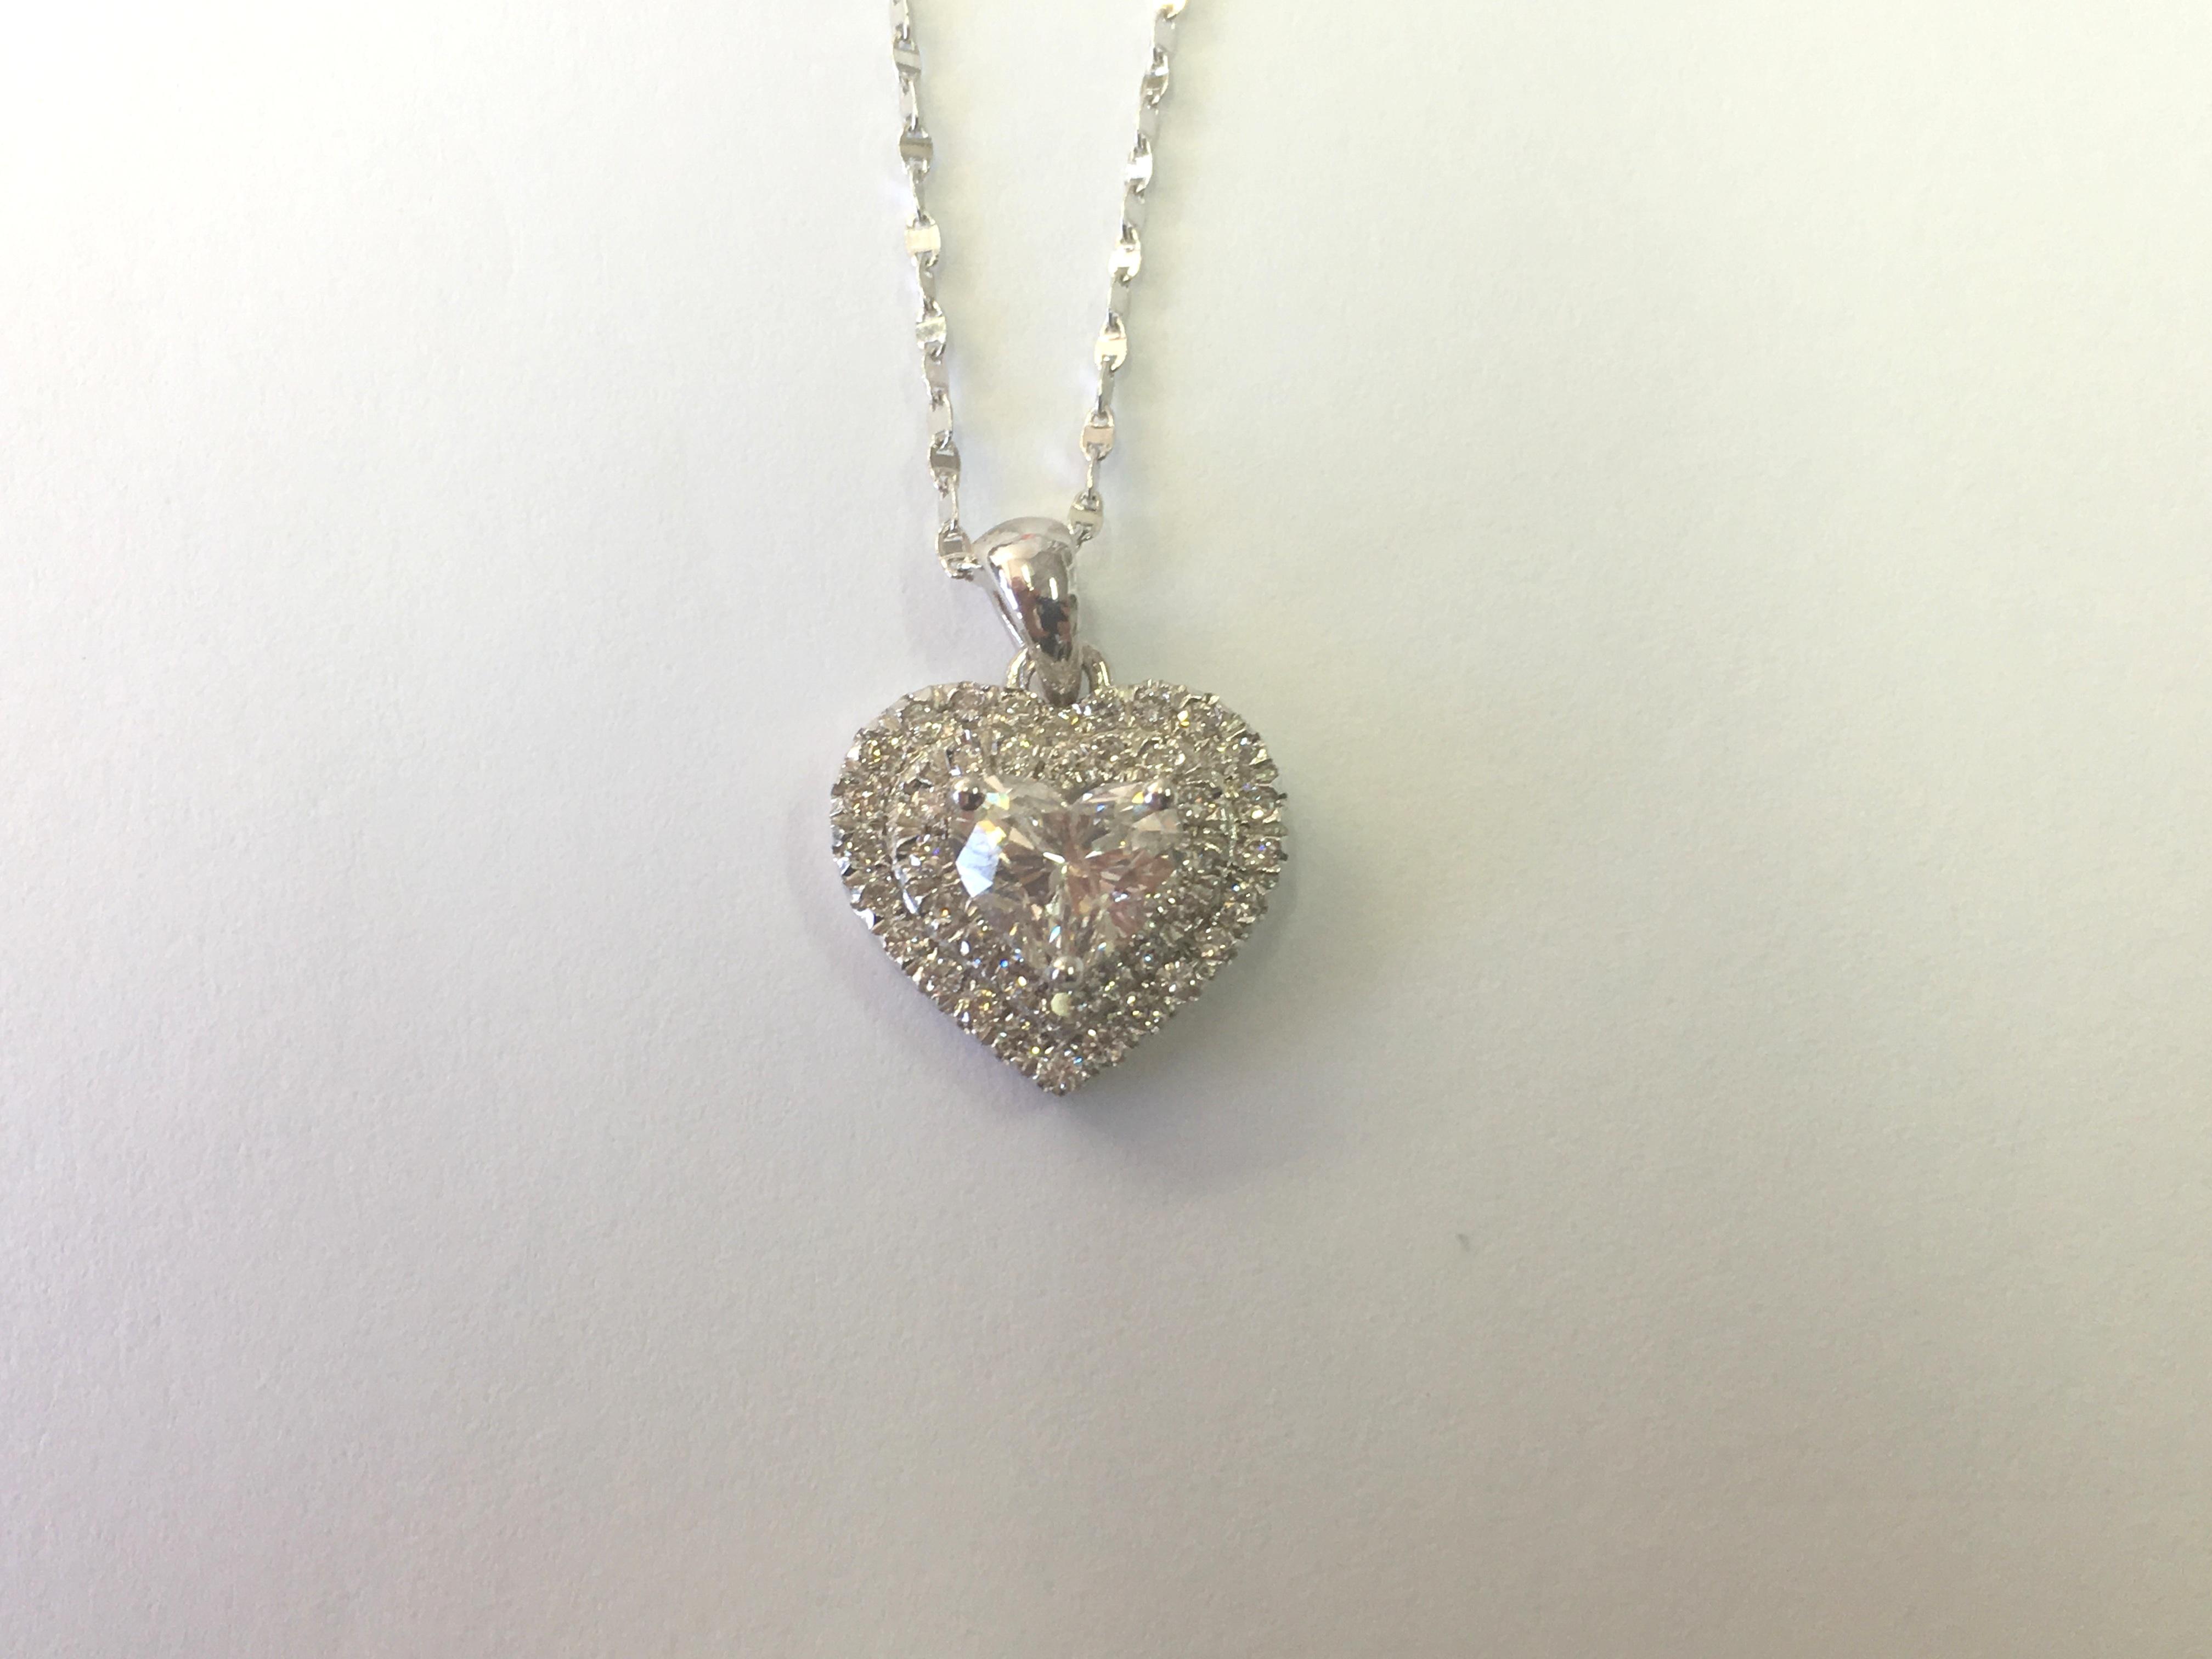 HEART CUT DIAMOND NECKLACE PENDANT APPRAISED 14K WHITE GOLD WOMEN